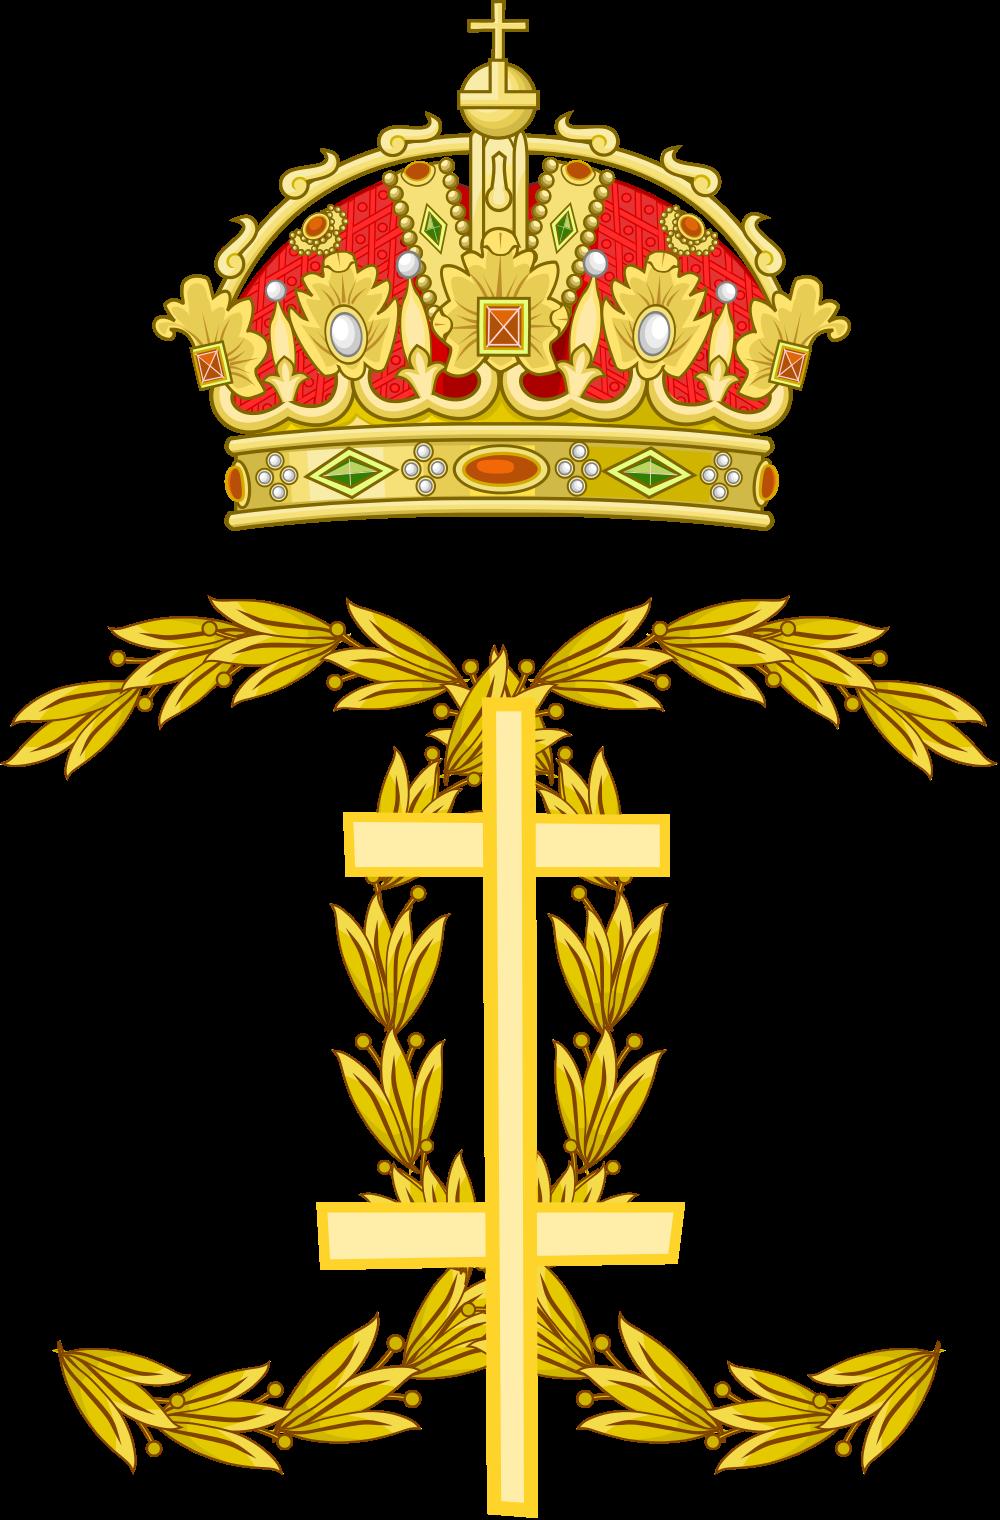 File:Monogram of Charles III, duke of Lorraine.svg.